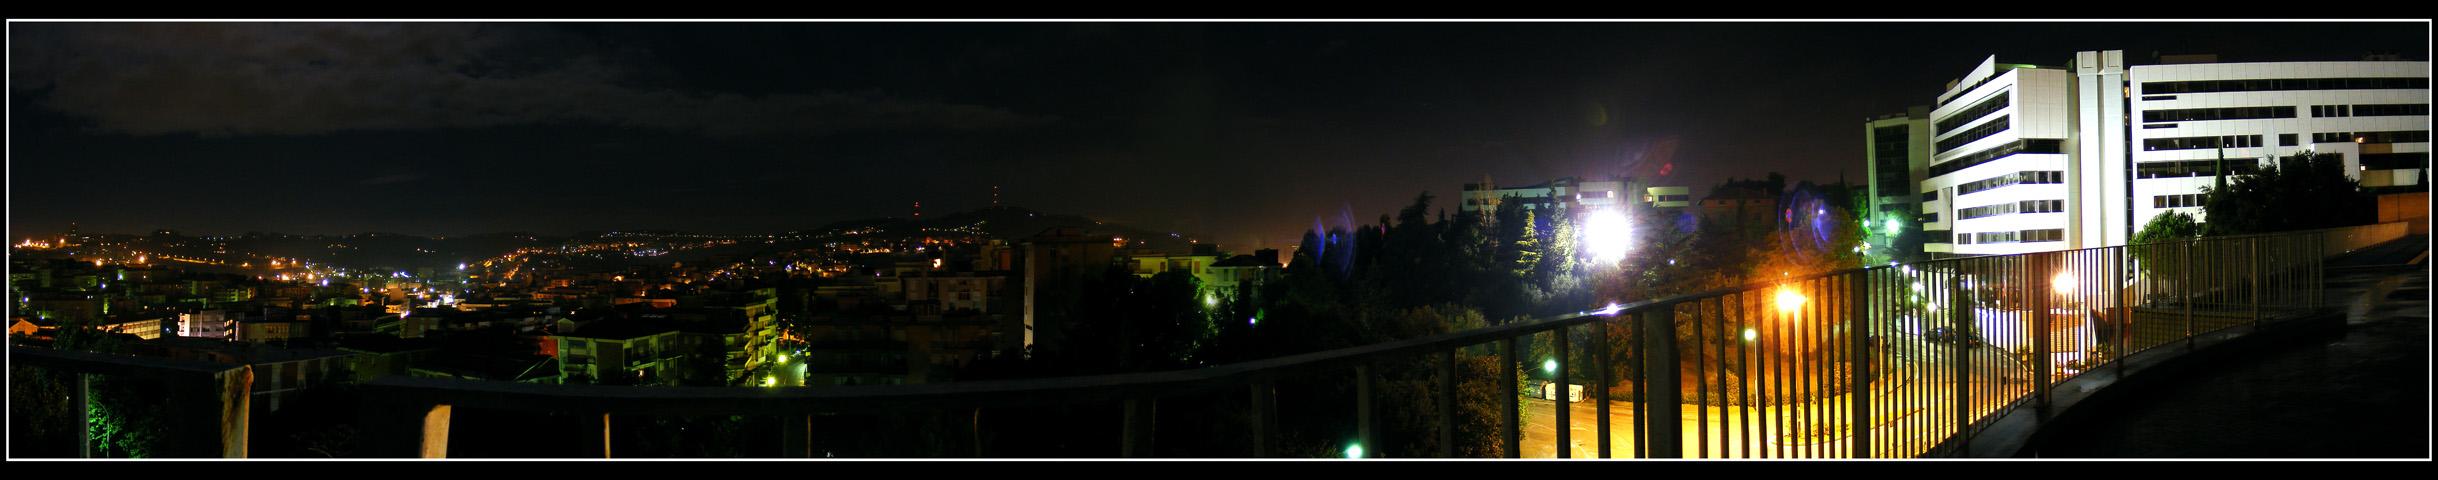 Notti Urbane 3